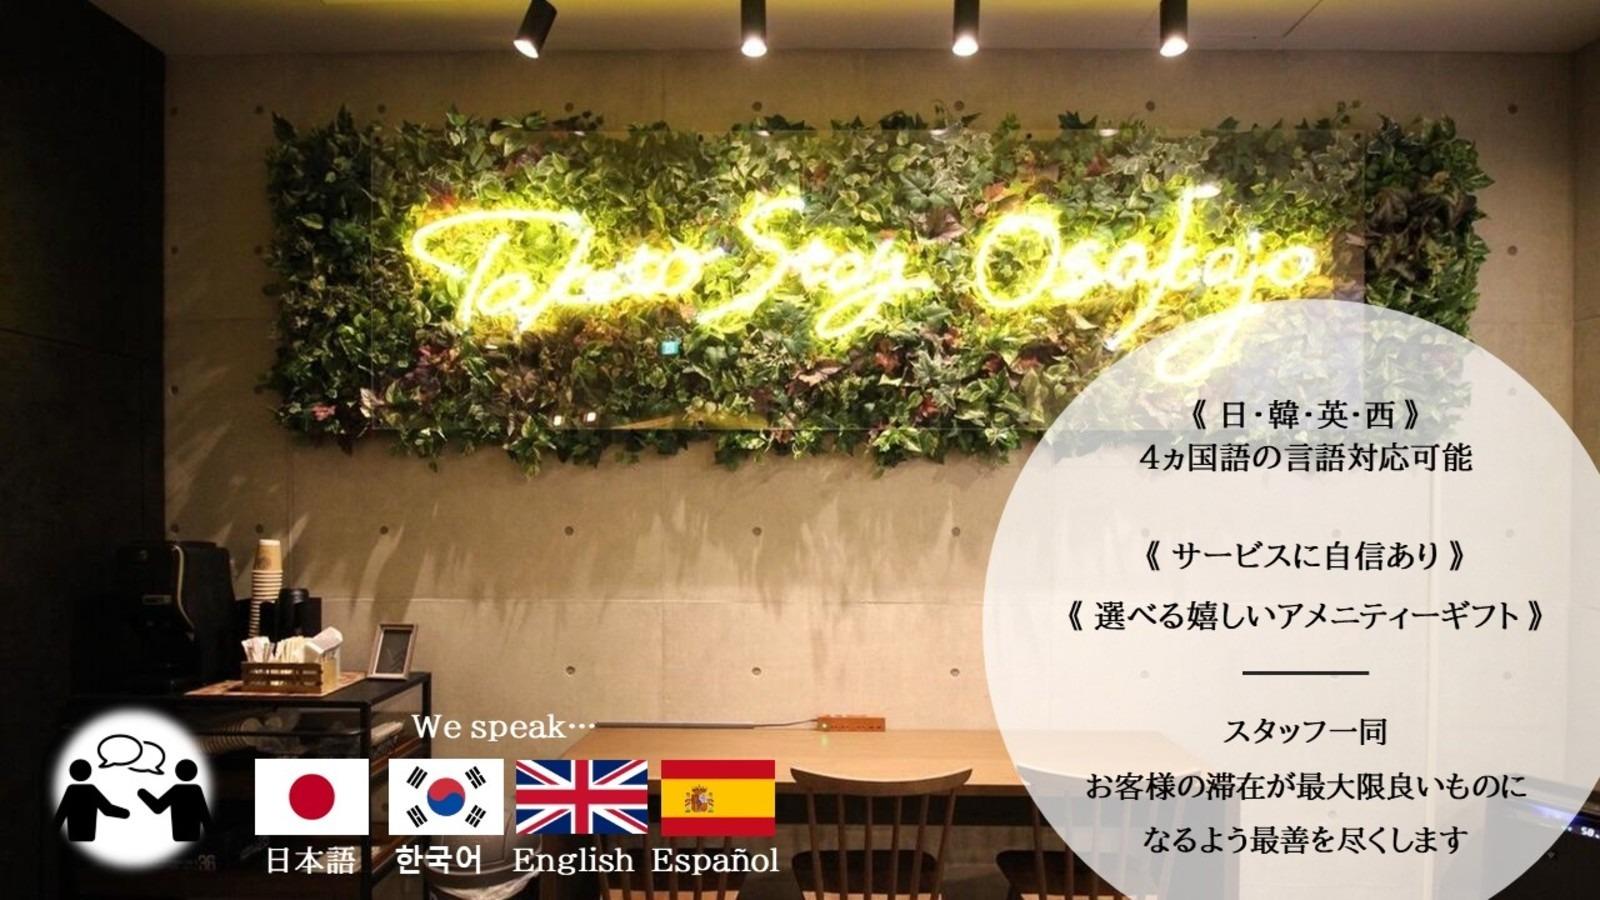 TO402:最大4名/無料コーヒーサービス有!/JR京橋駅徒歩2分